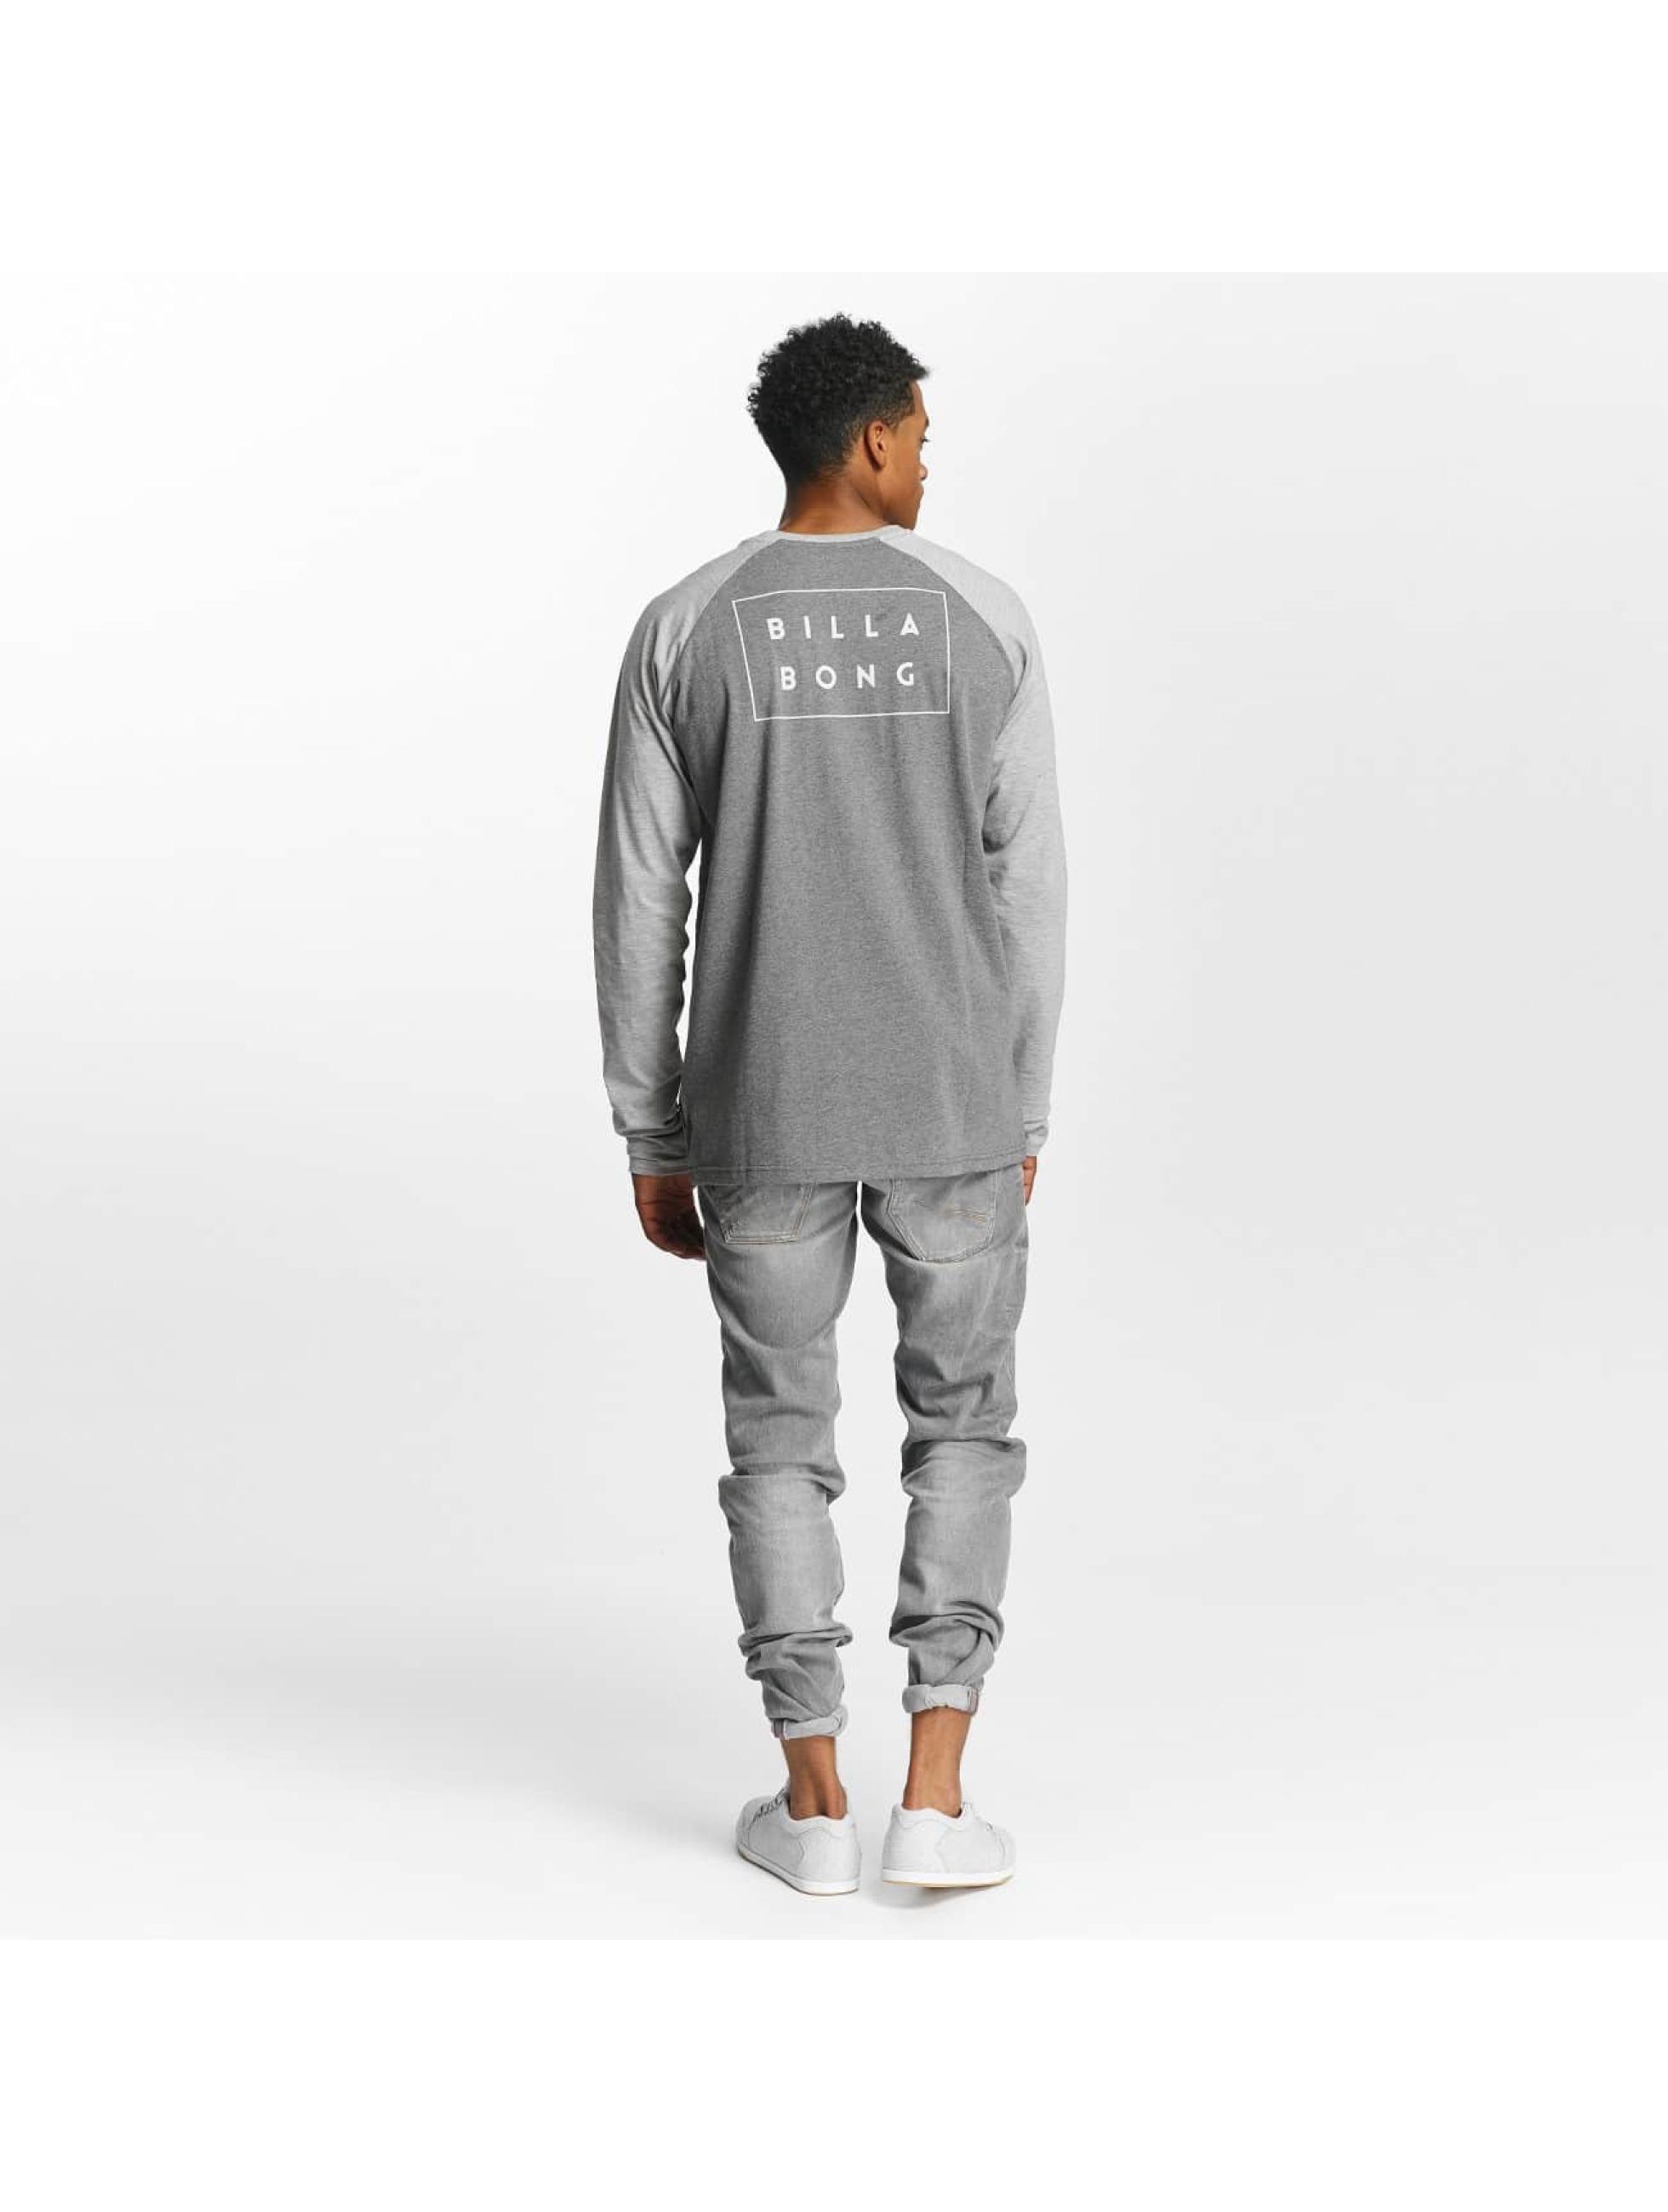 Billabong Longsleeve Die Cut gray